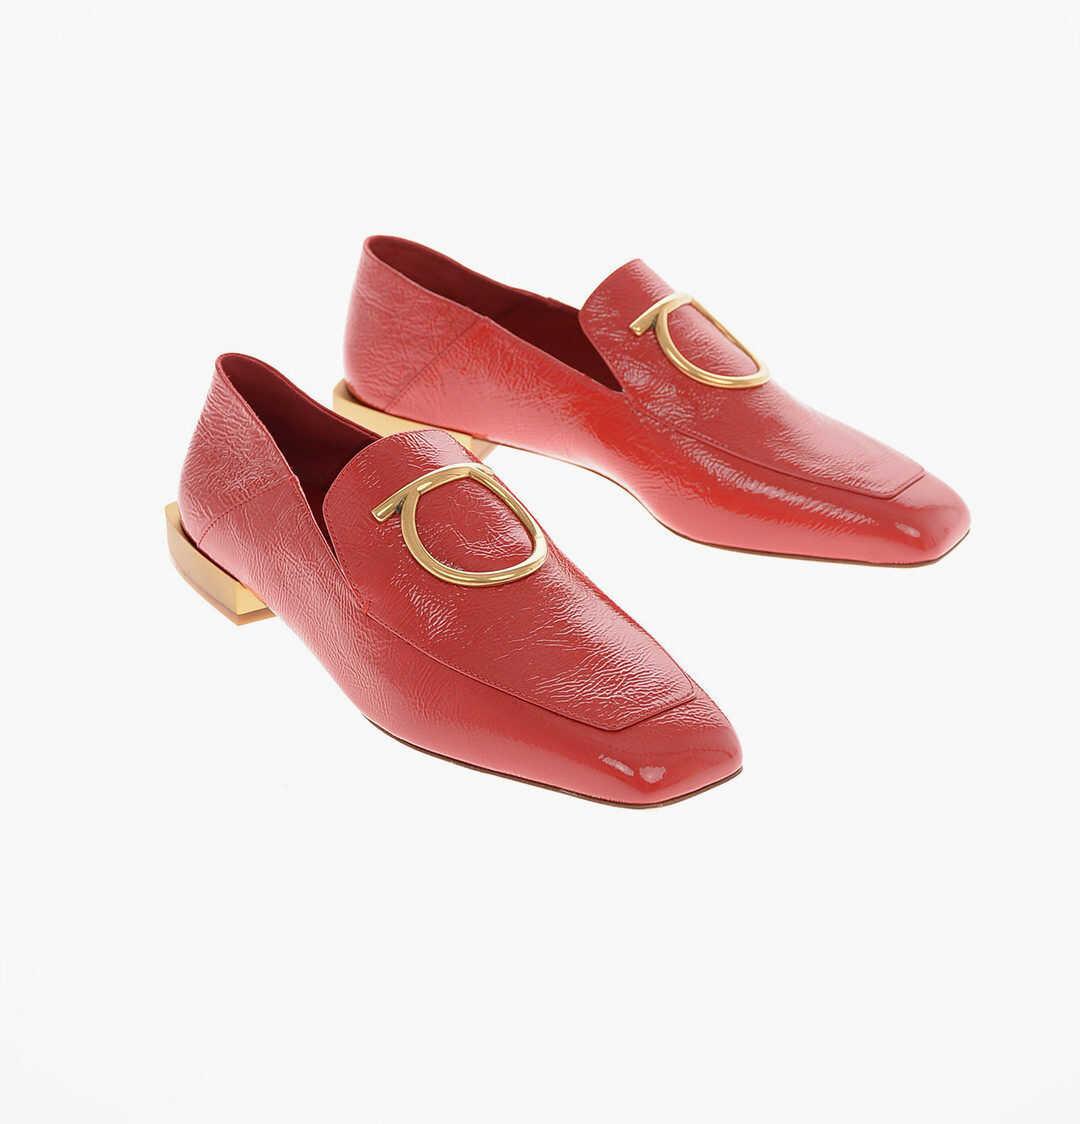 Salvatore Ferragamo leather LANA Penny loafers RED imagine b-mall.ro